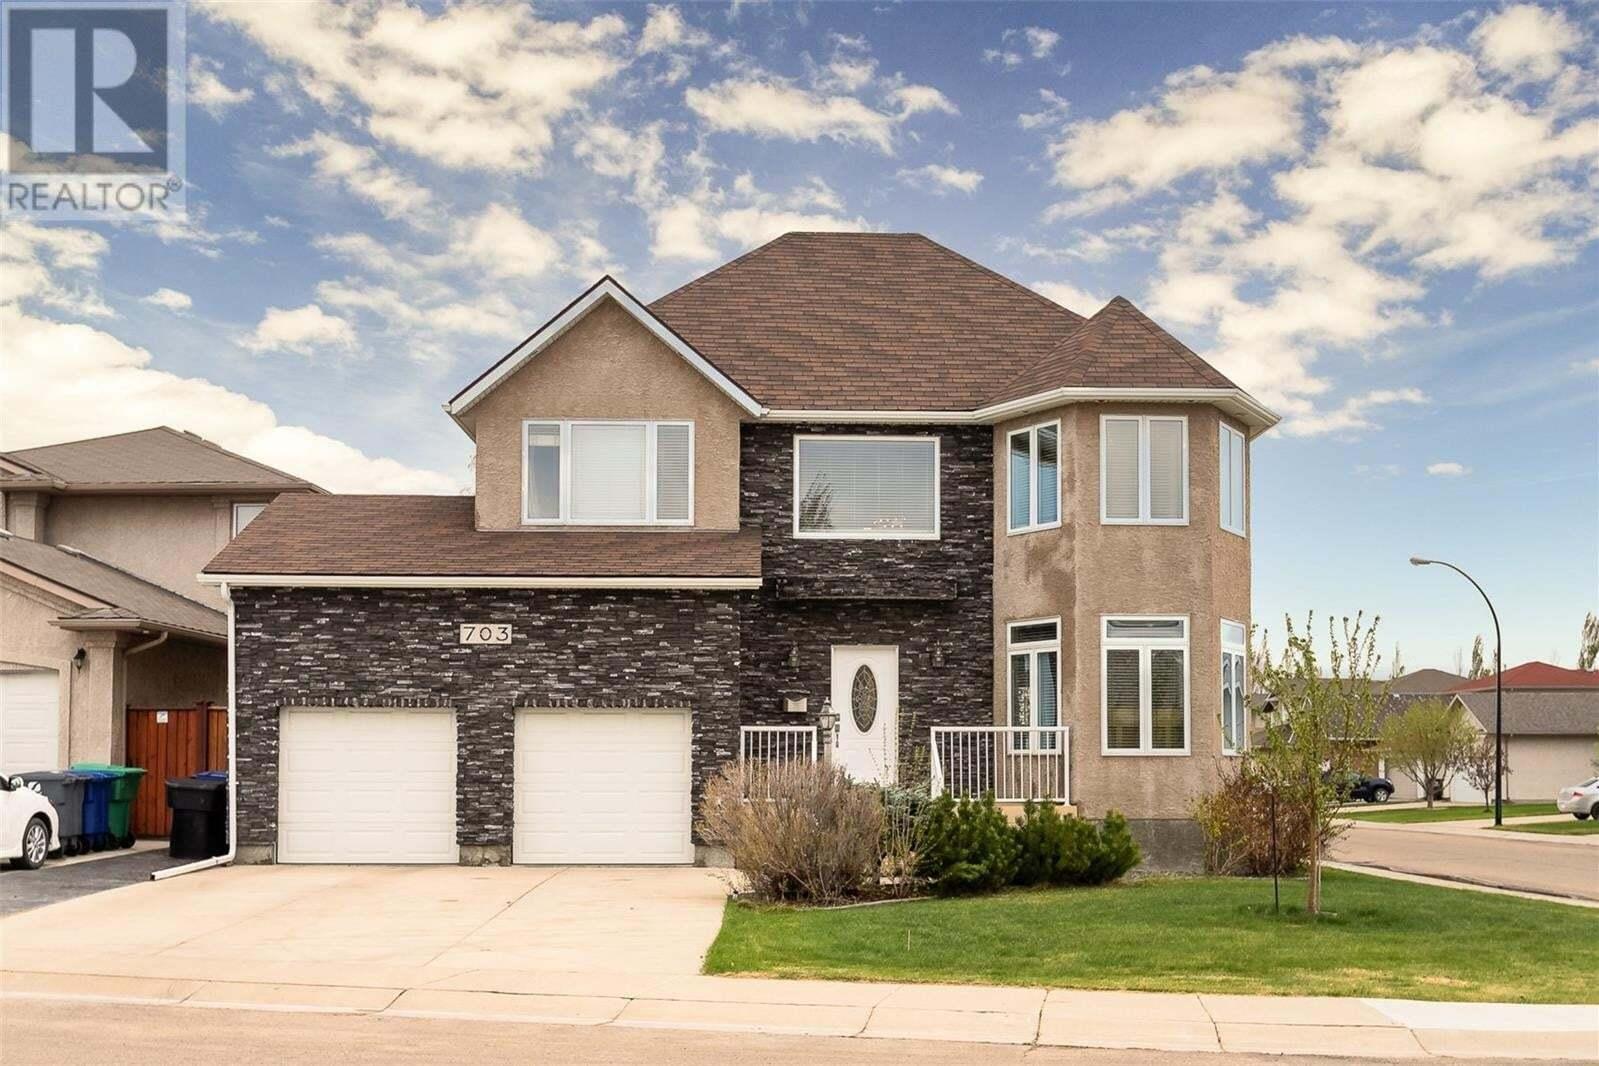 House for sale at 703 Greaves Cres Saskatoon Saskatchewan - MLS: SK809068